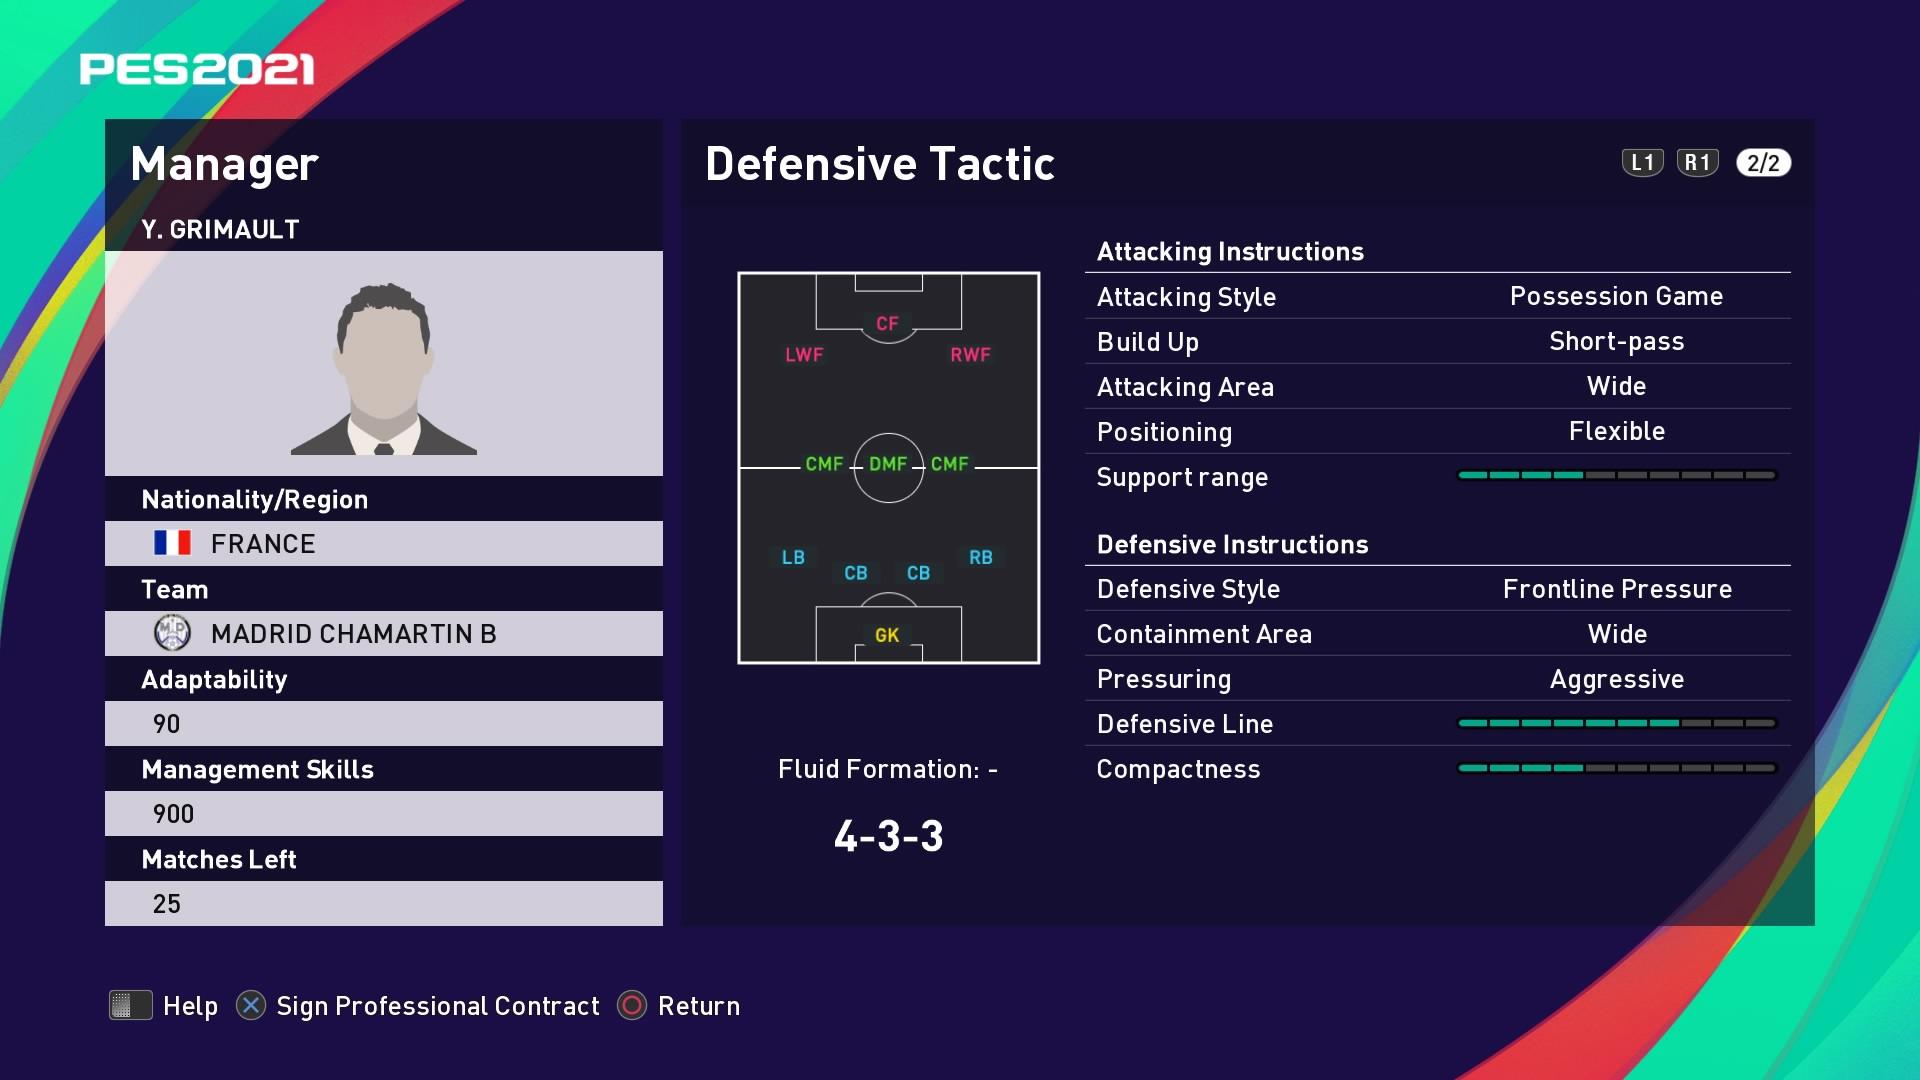 Y. Grimault (Zinedine Zidane) Defensive Tactic in PES 2021 myClub